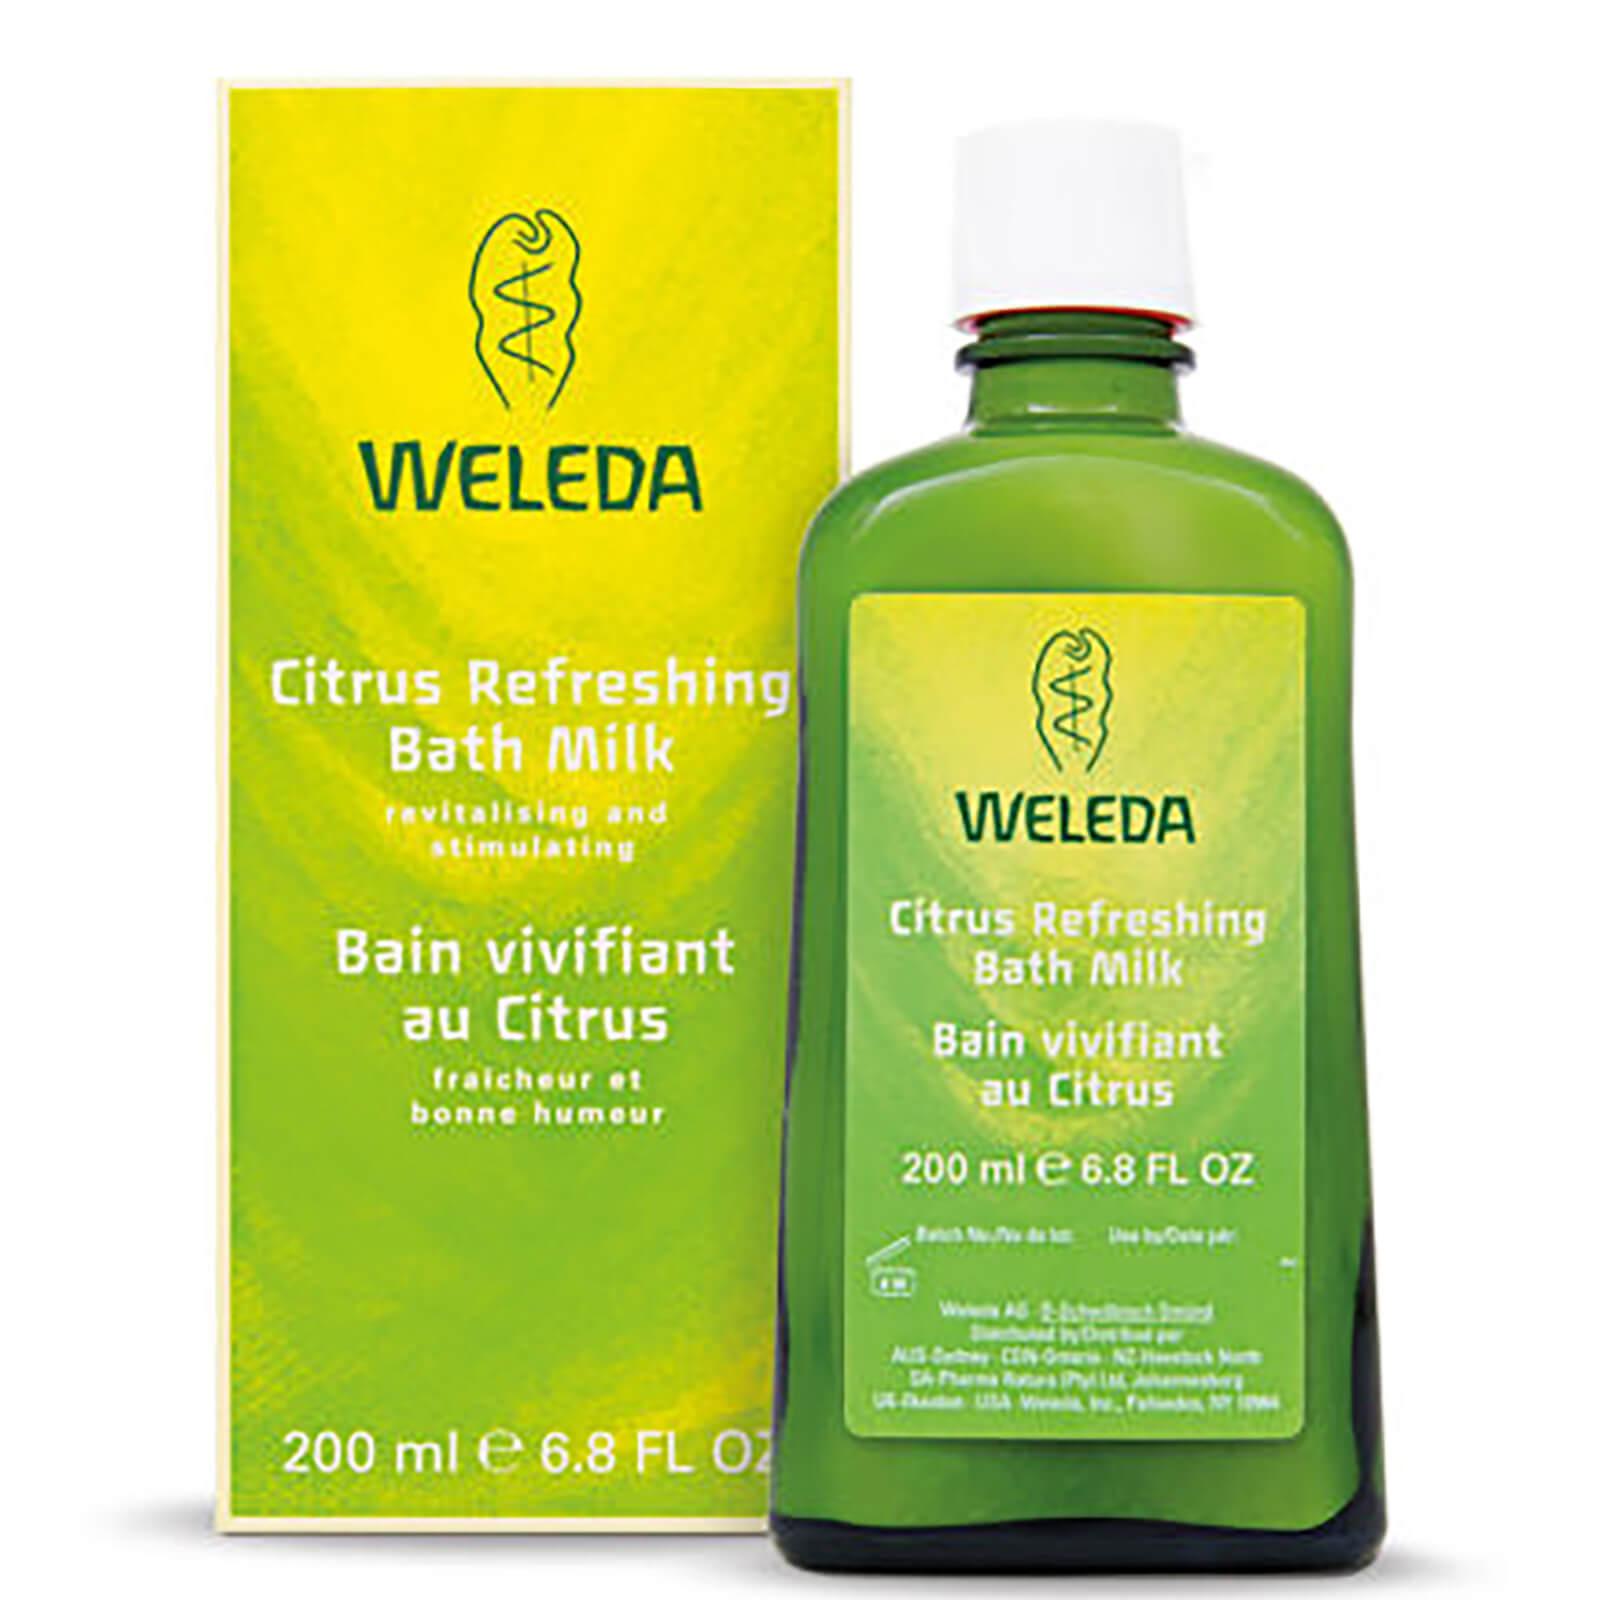 Weleda Bain vivifiant au citrus de Weleda (200 ml)